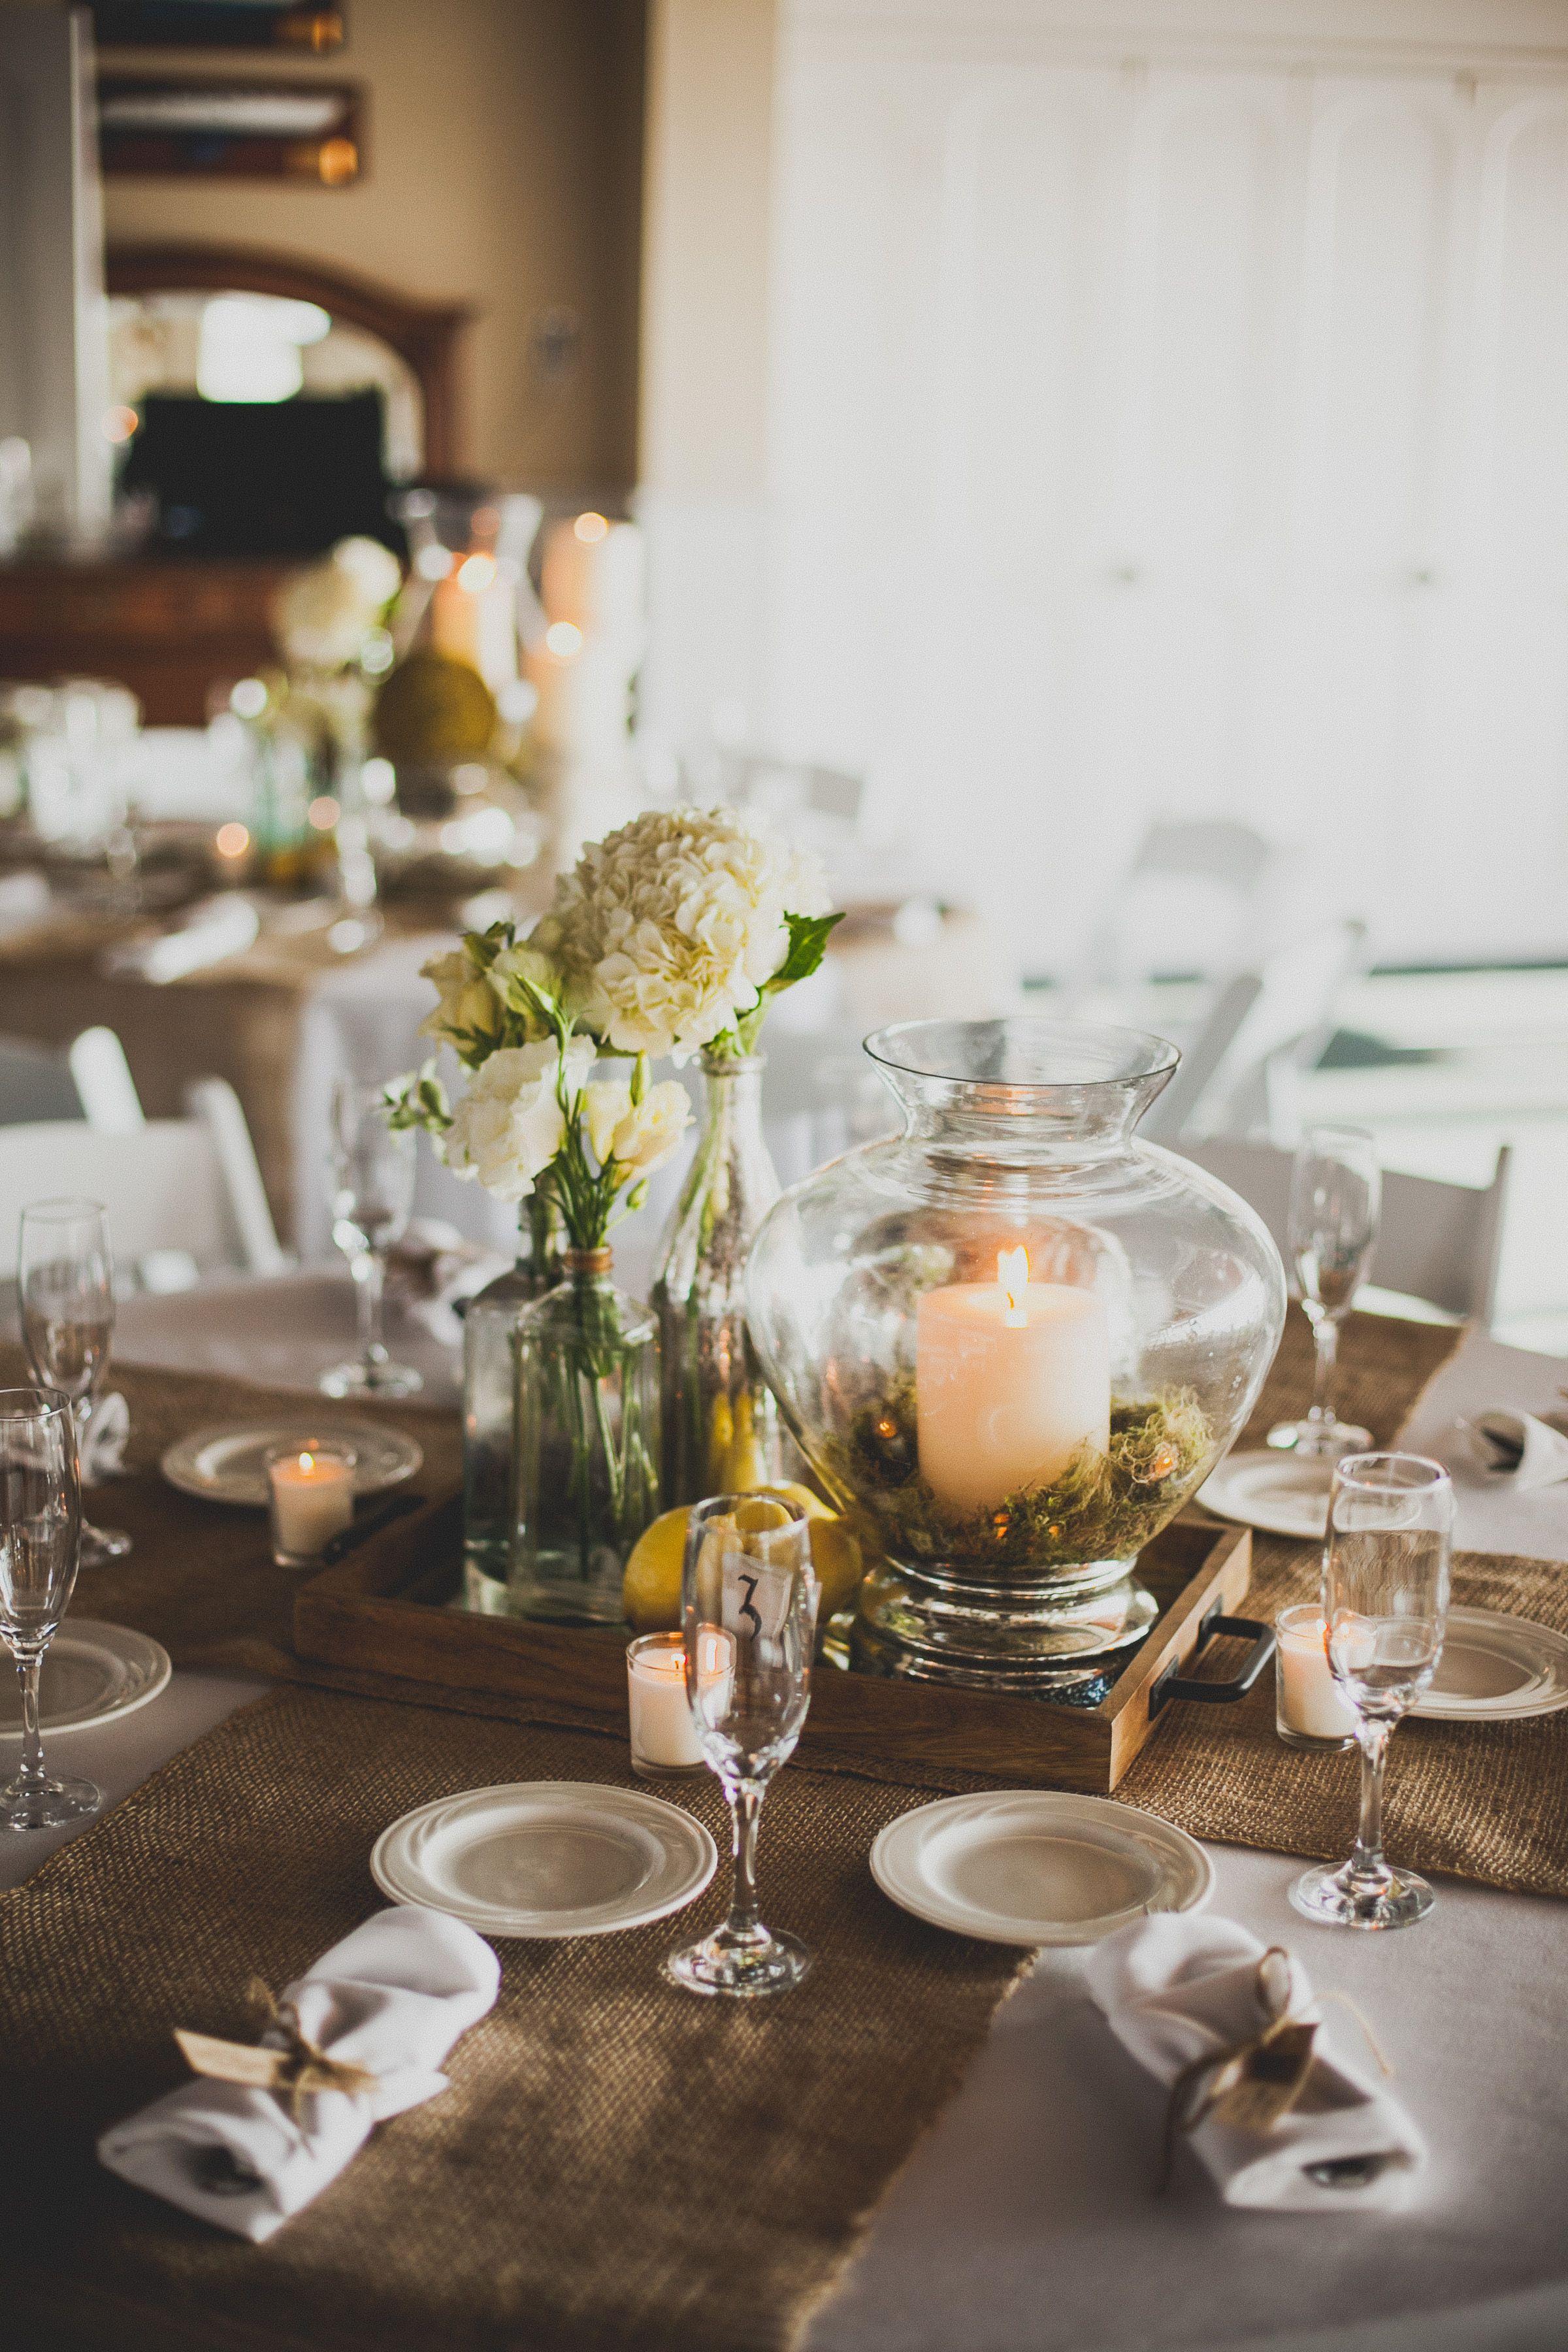 Yacht wedding decorations  An ohsoadorable rustic tablescape  Dream Harbor  Pinterest